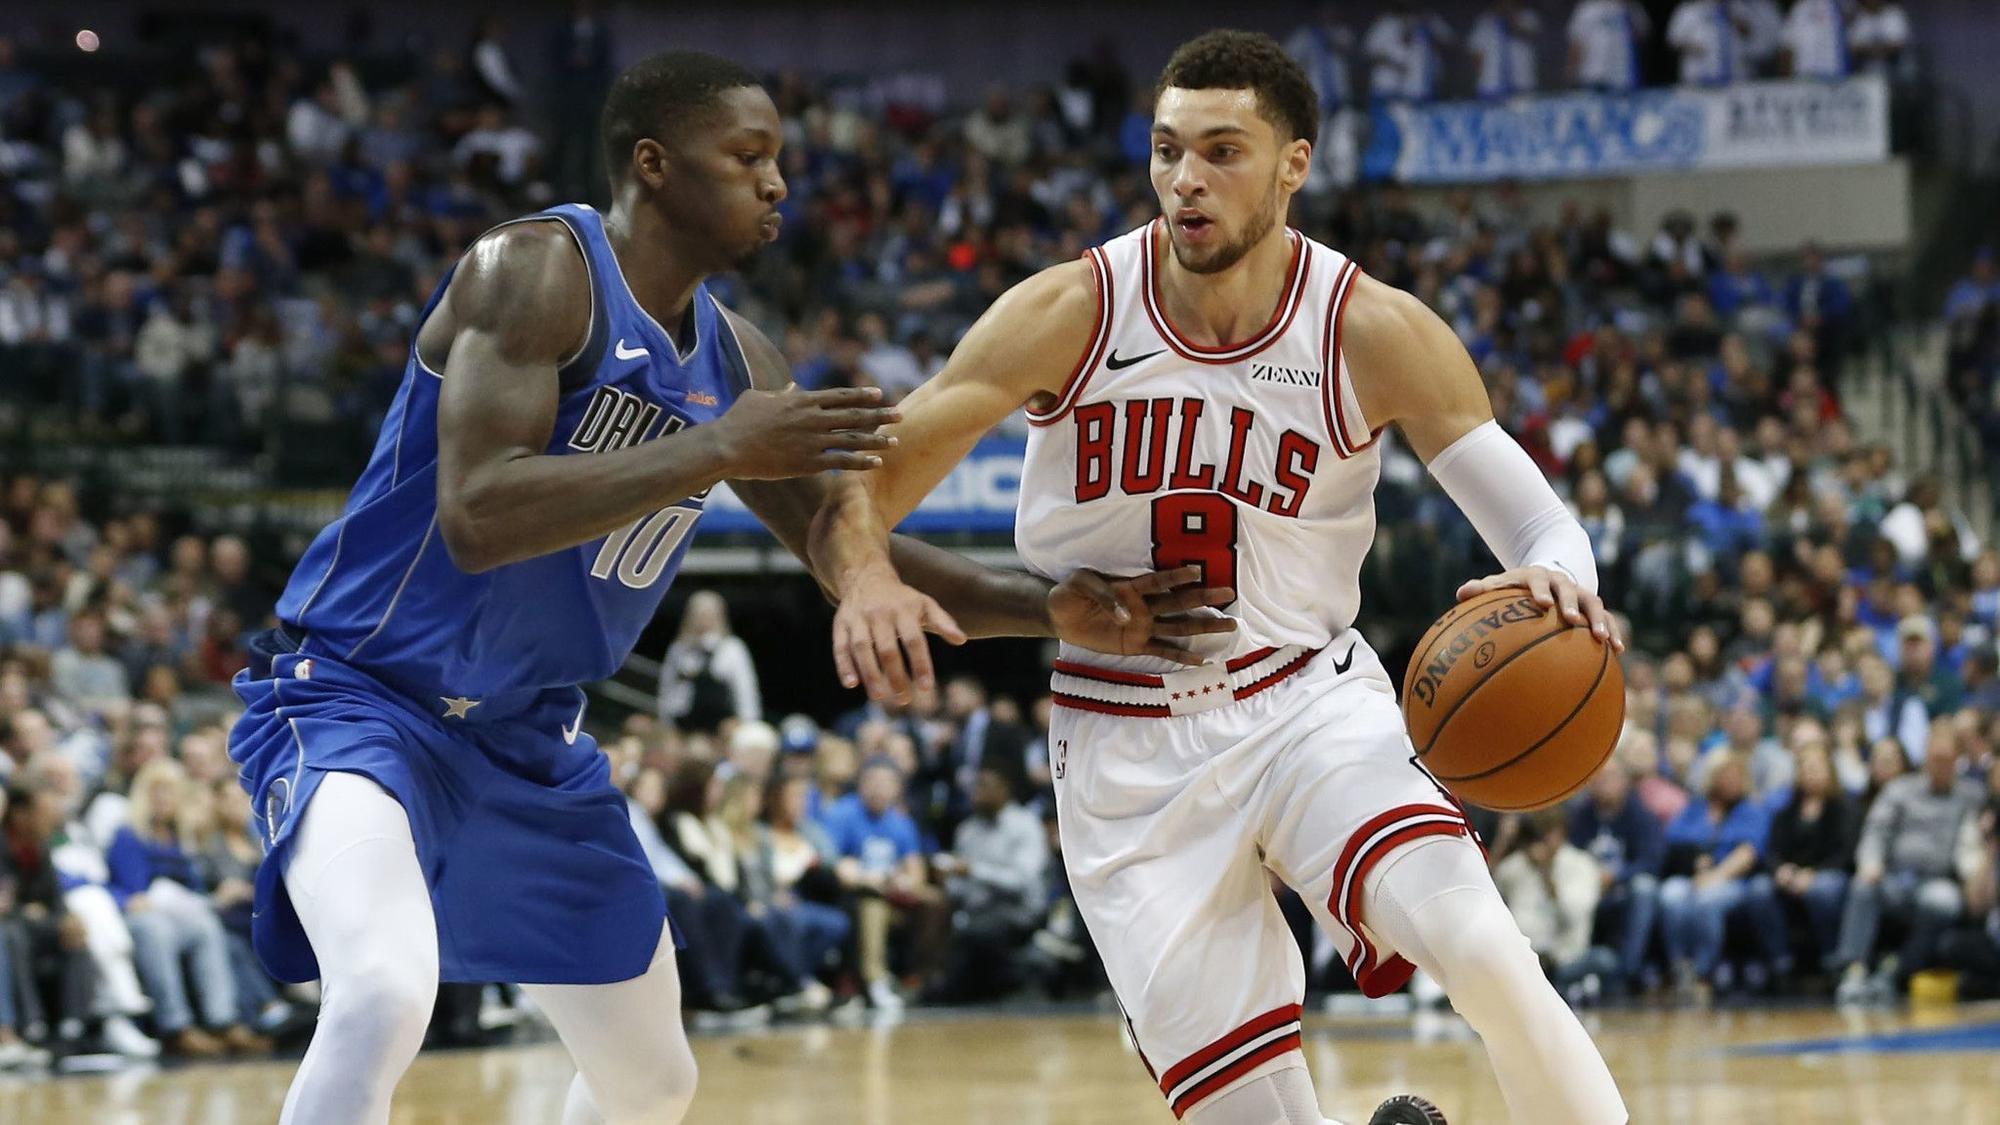 b5e98baf99e  We lost our composure   Communication breakdowns plague Bulls in 115-109  loss - Chicago Tribune